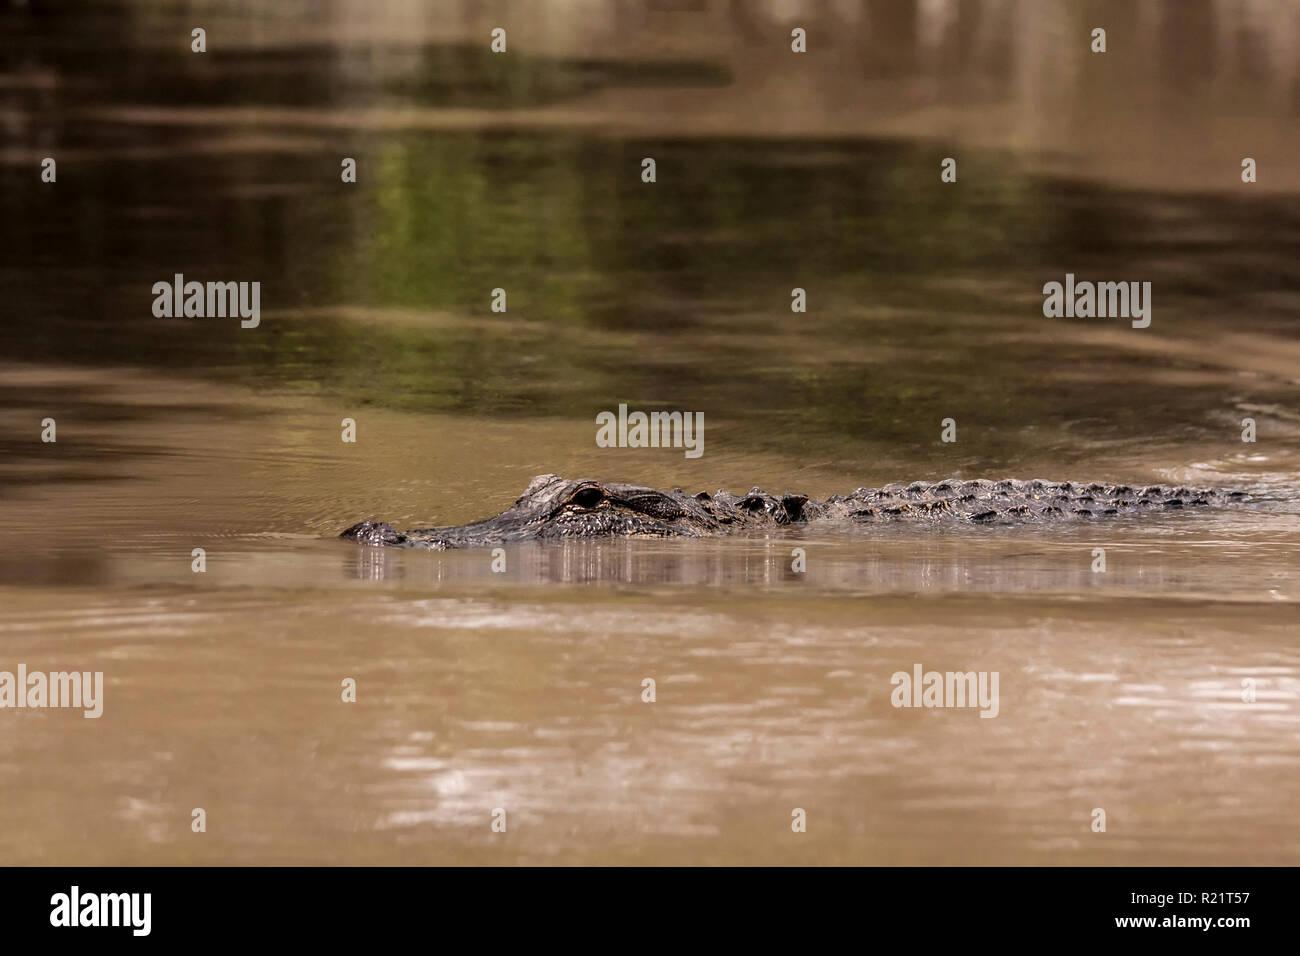 American crocodile in a water - Stock Image